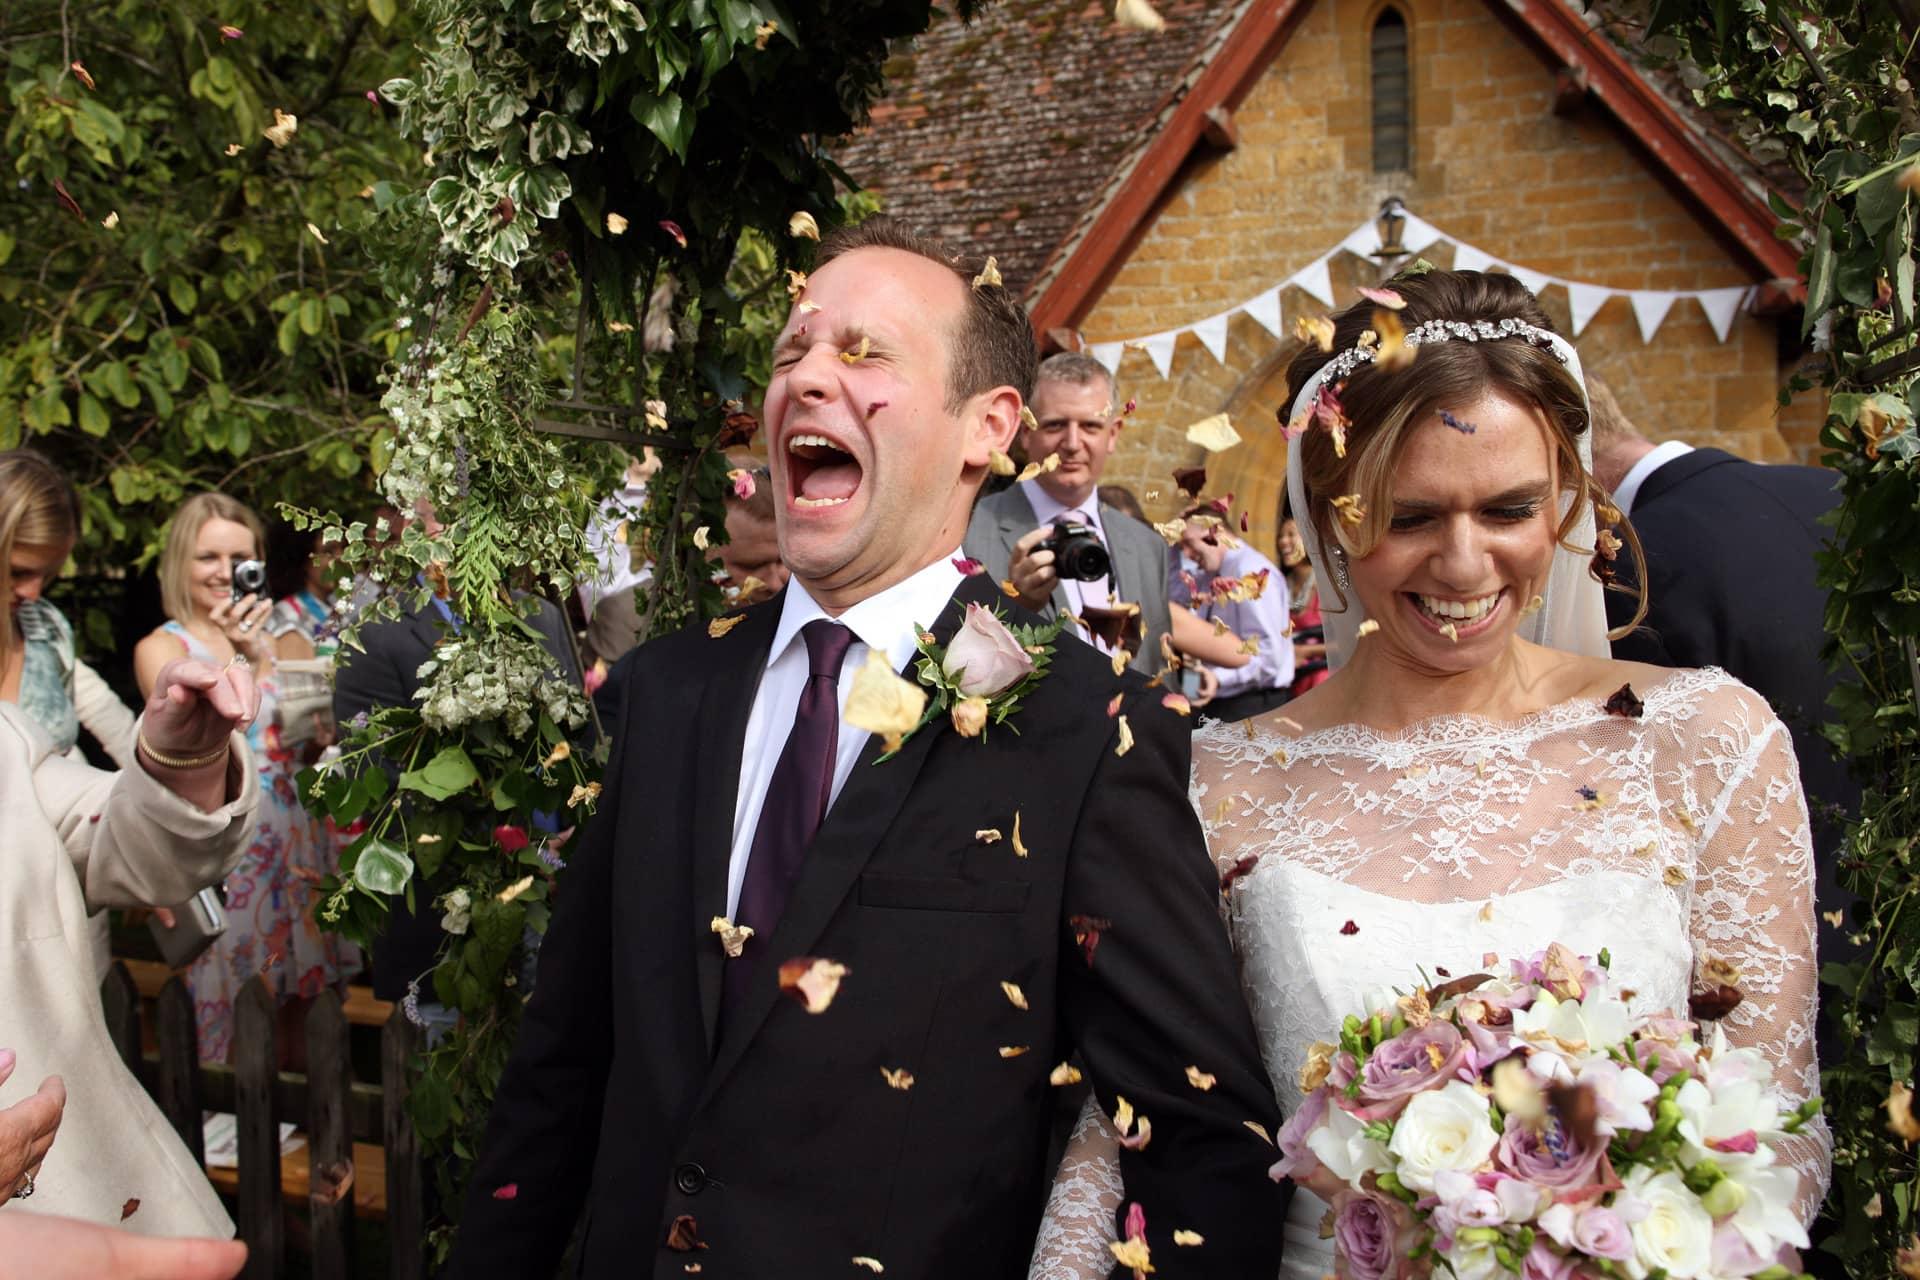 wedding-confetti-tiny-dorset-church